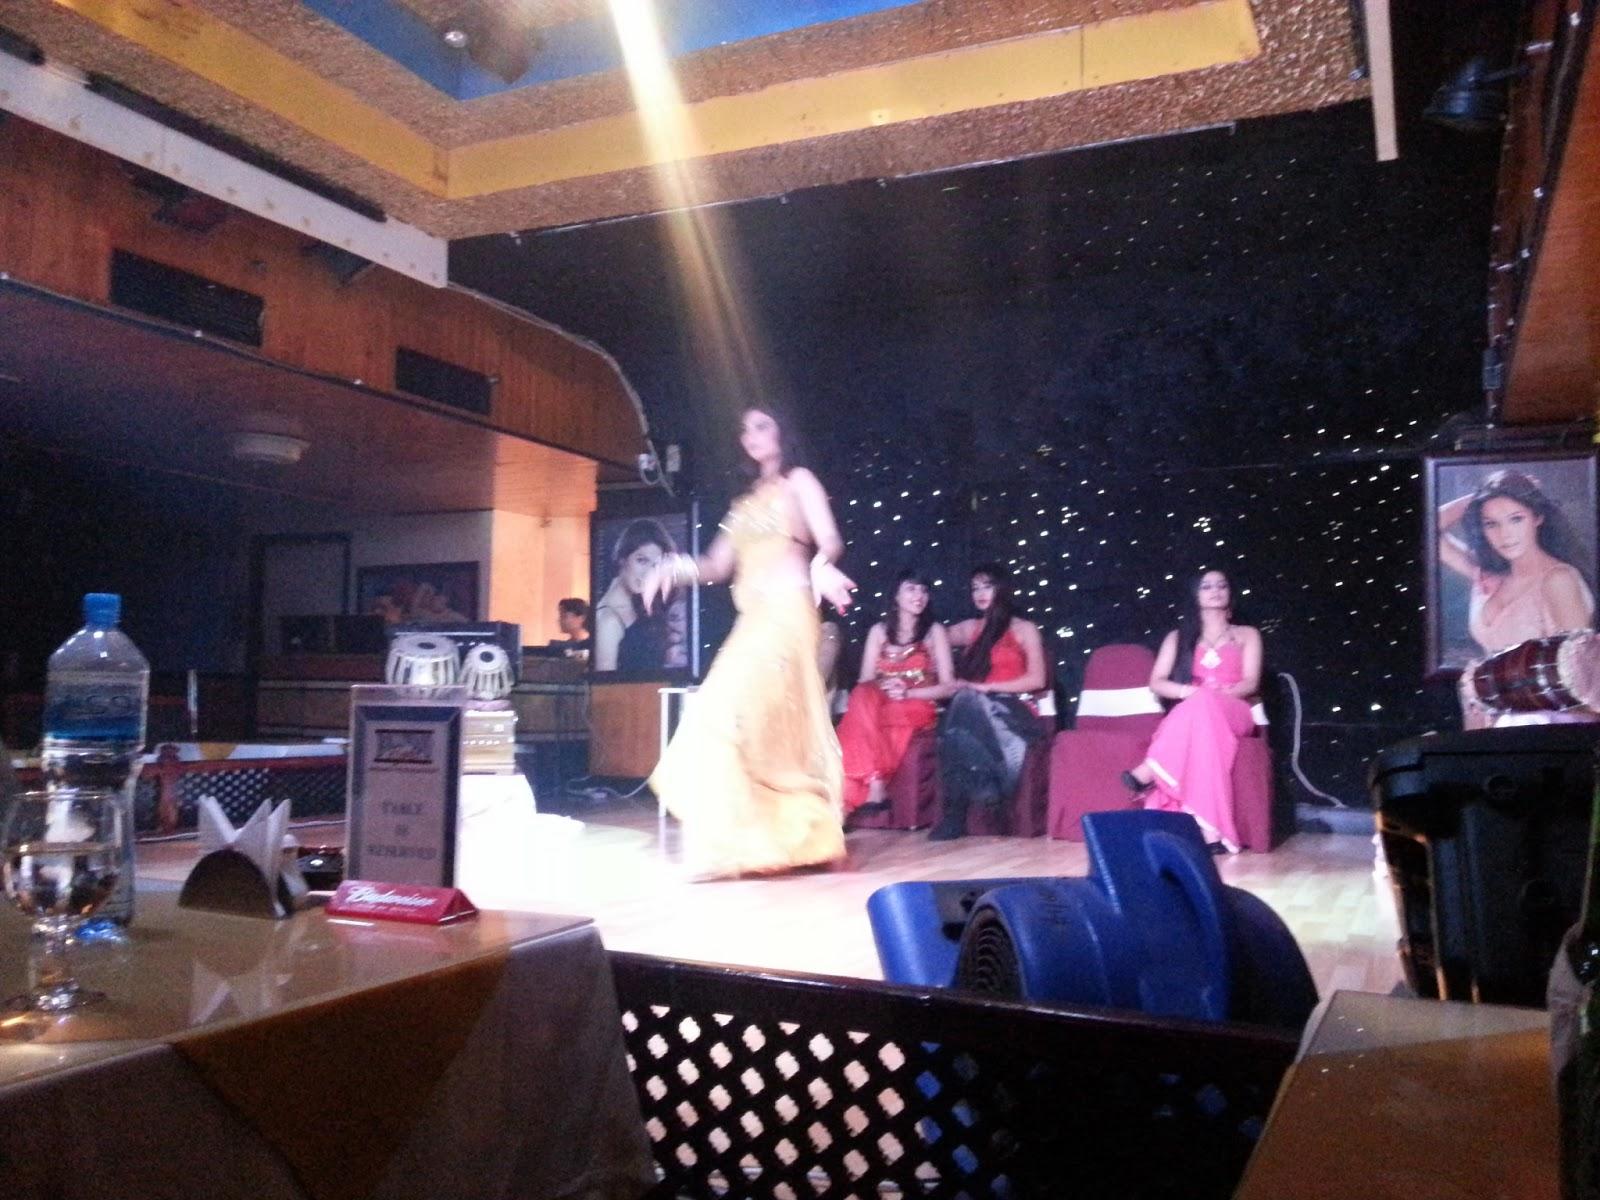 couples k hotel bahrain prostitutes